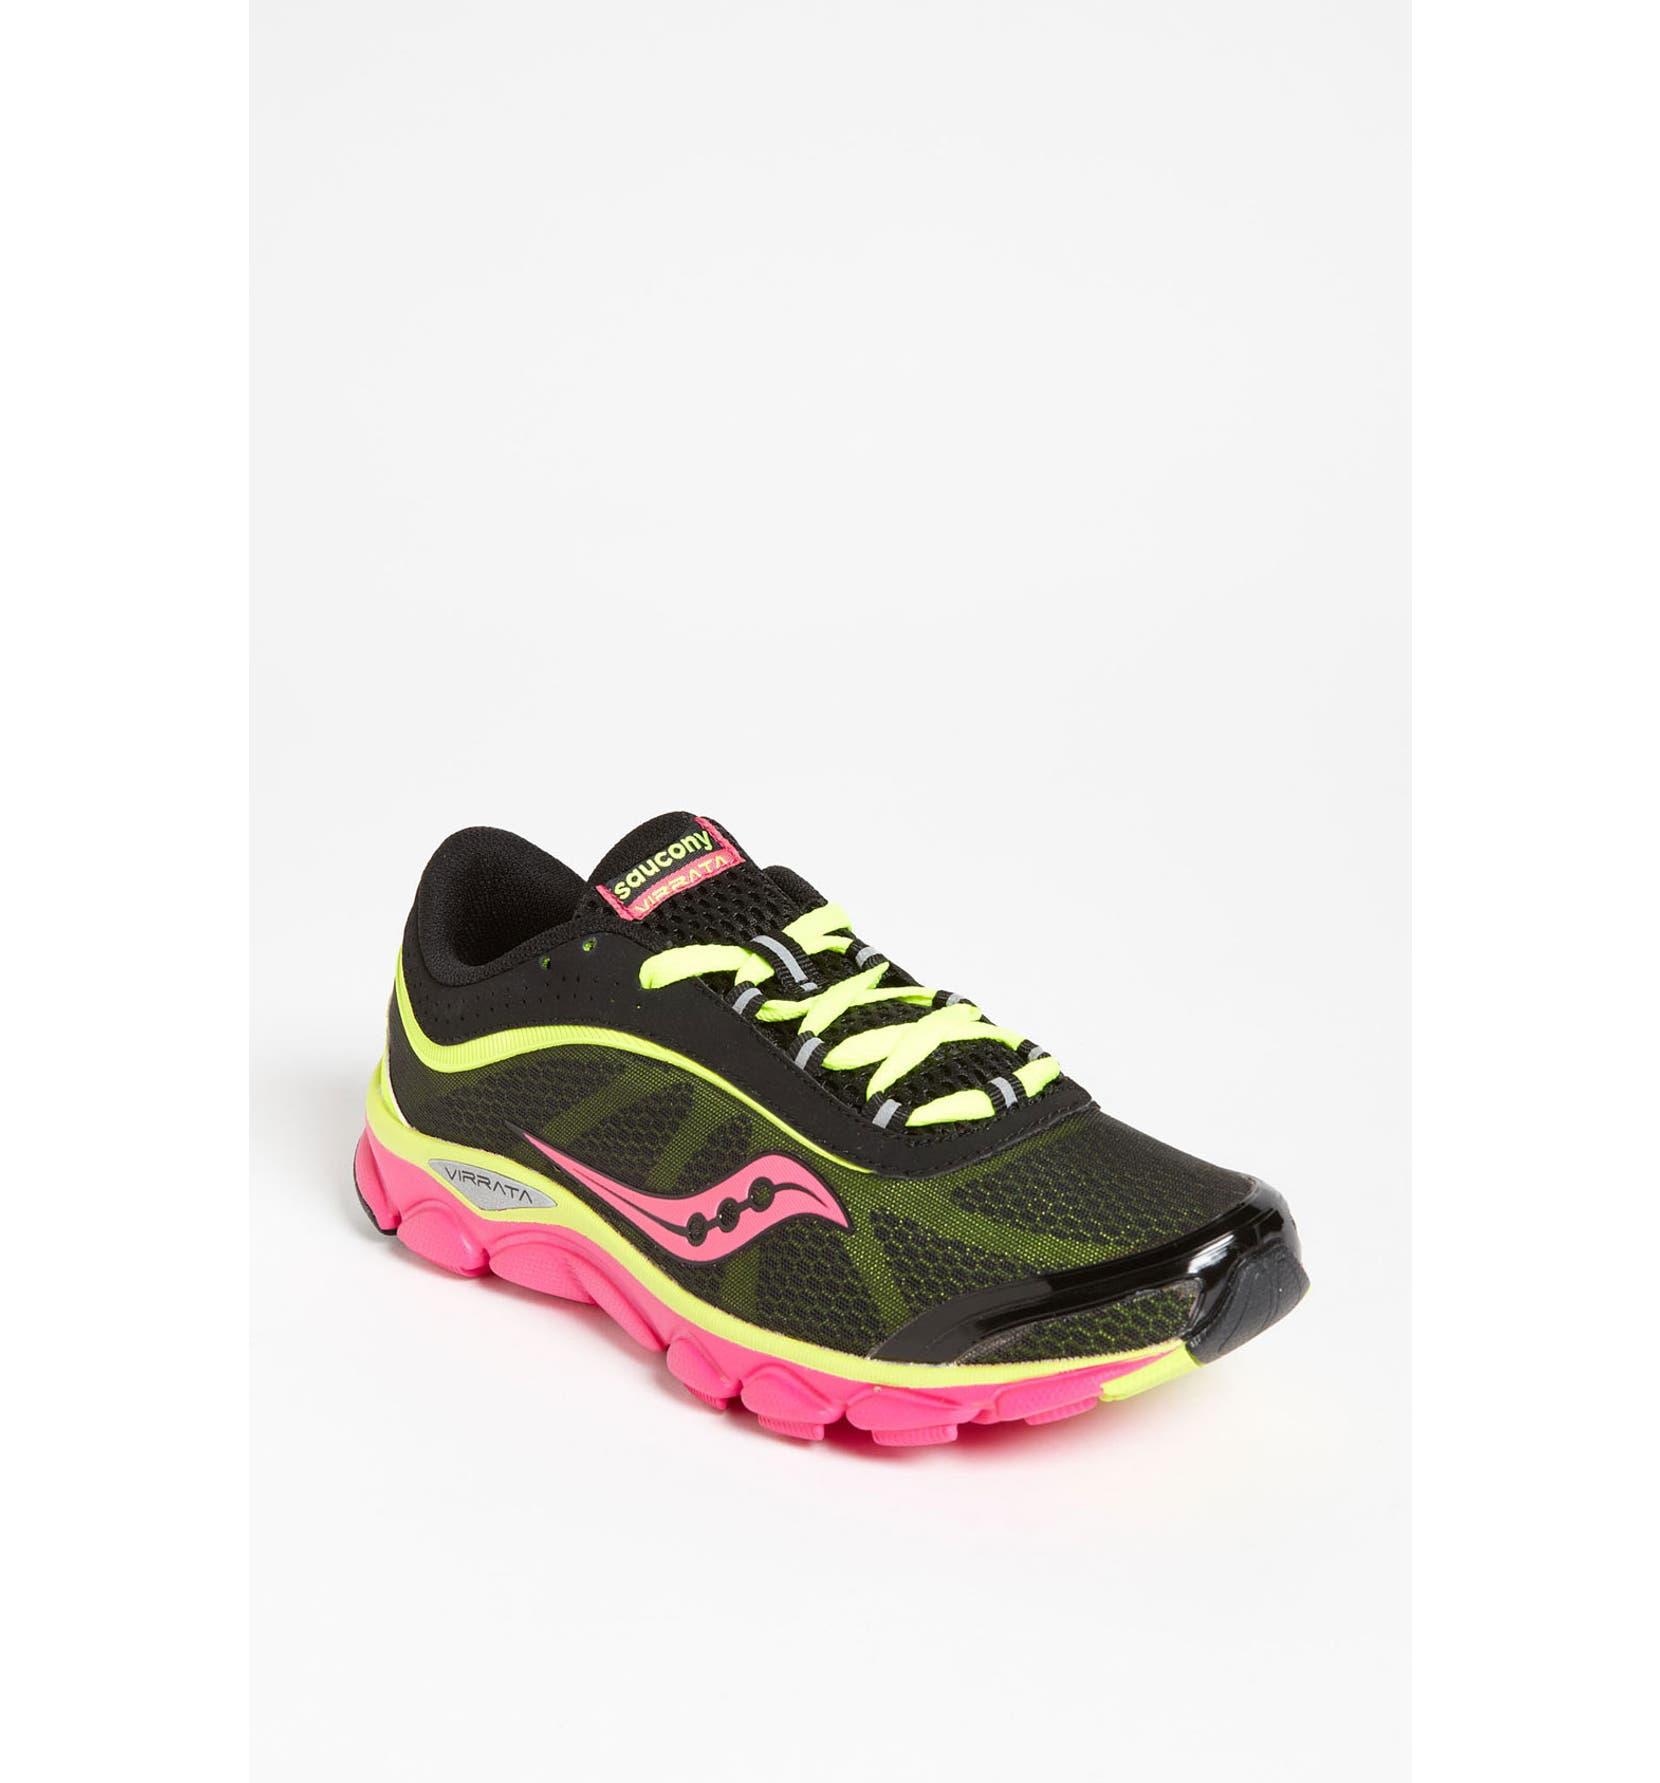 1e3240cbc12f9 'Virrata' Running Shoe